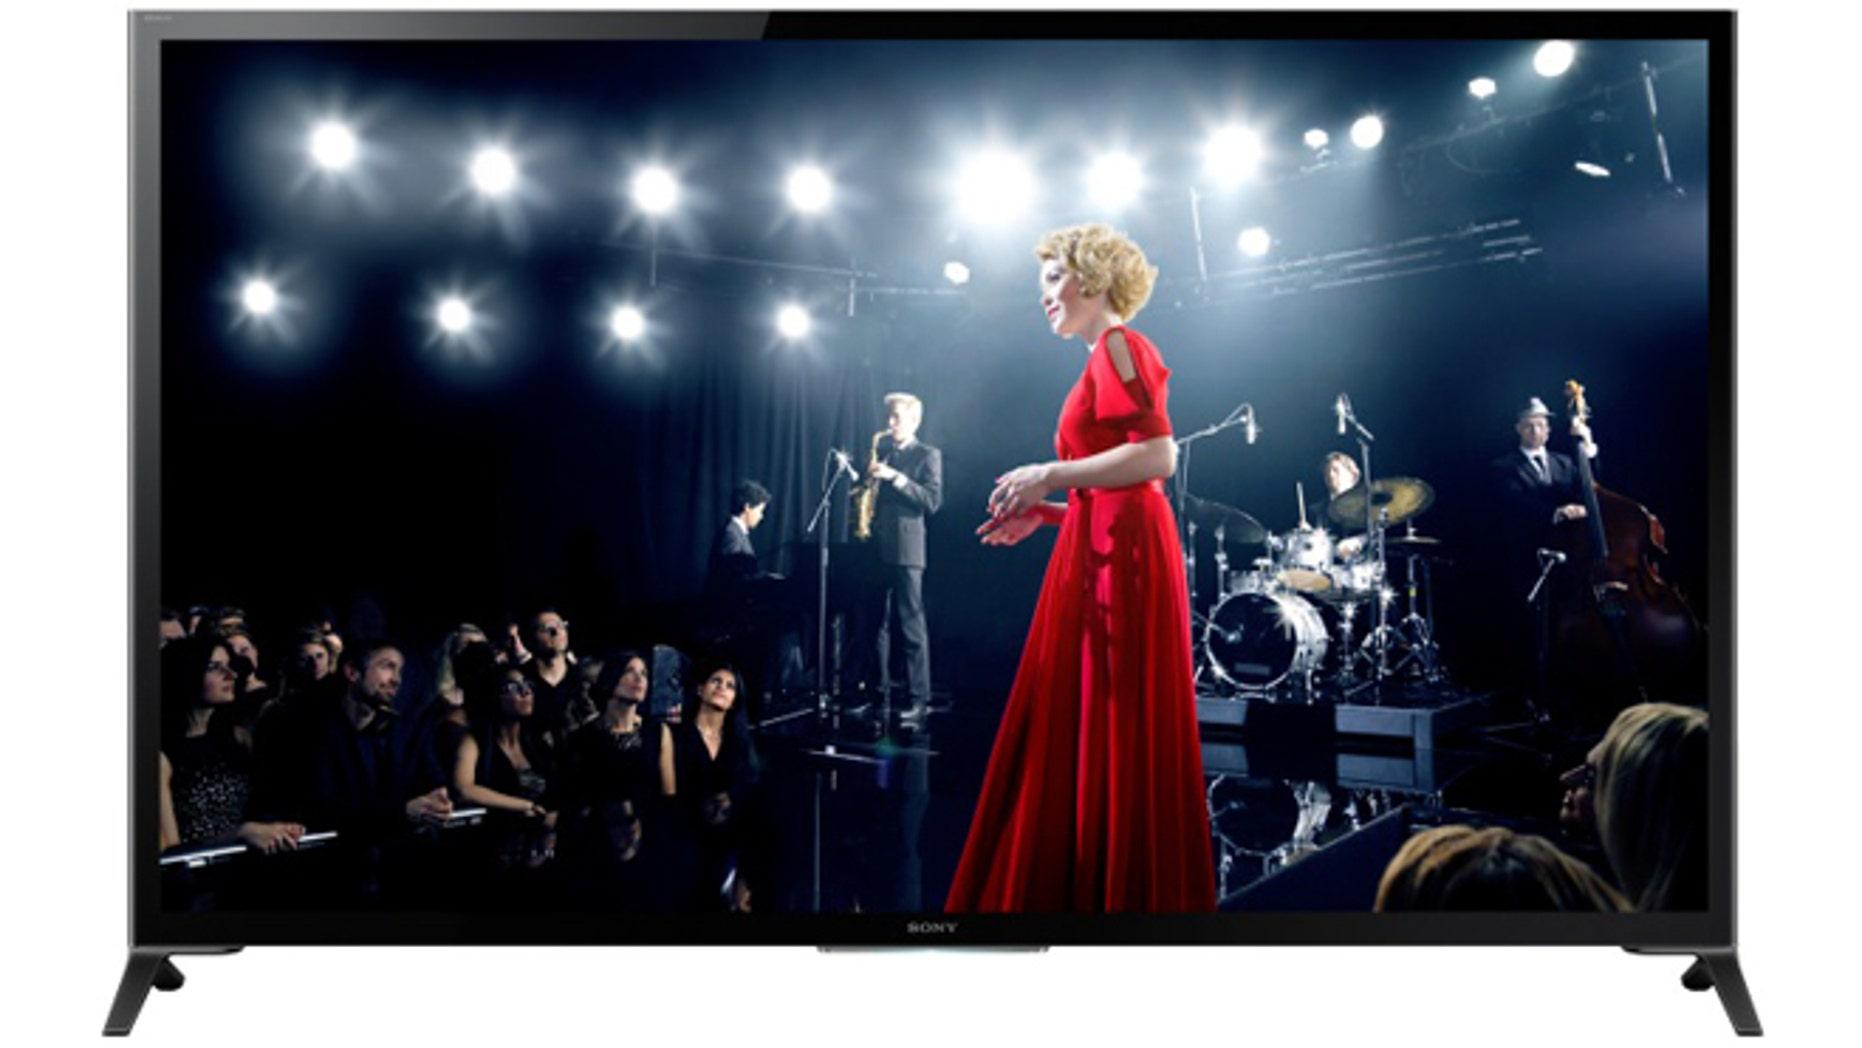 Sony's flagship 64-inch X950B 4K Ultra HD TV.